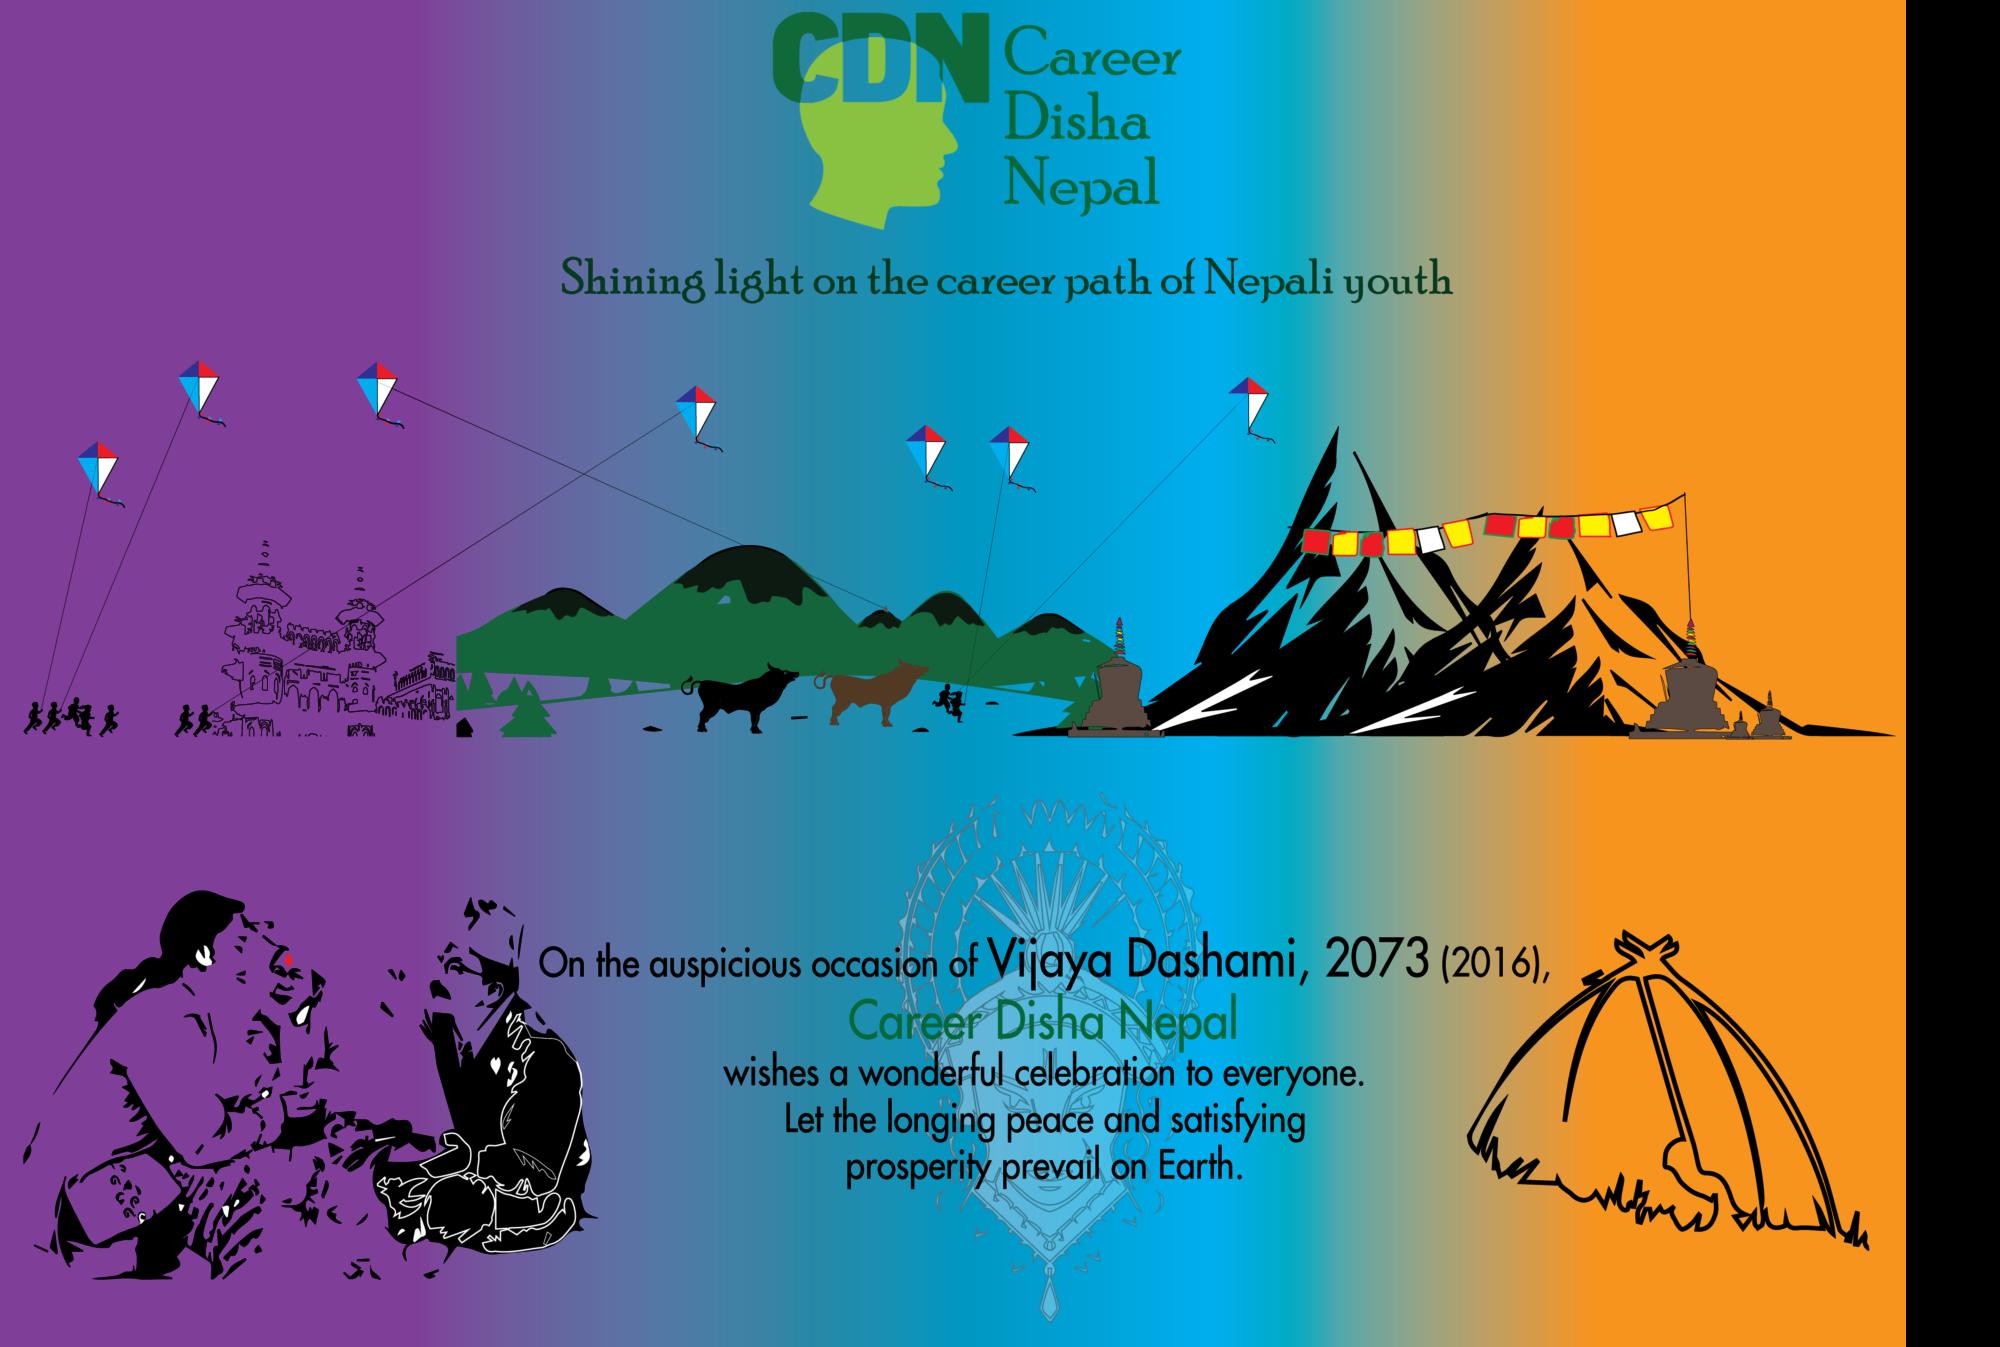 Happy Vijaya Dashami 2073 Career Disha Nepal